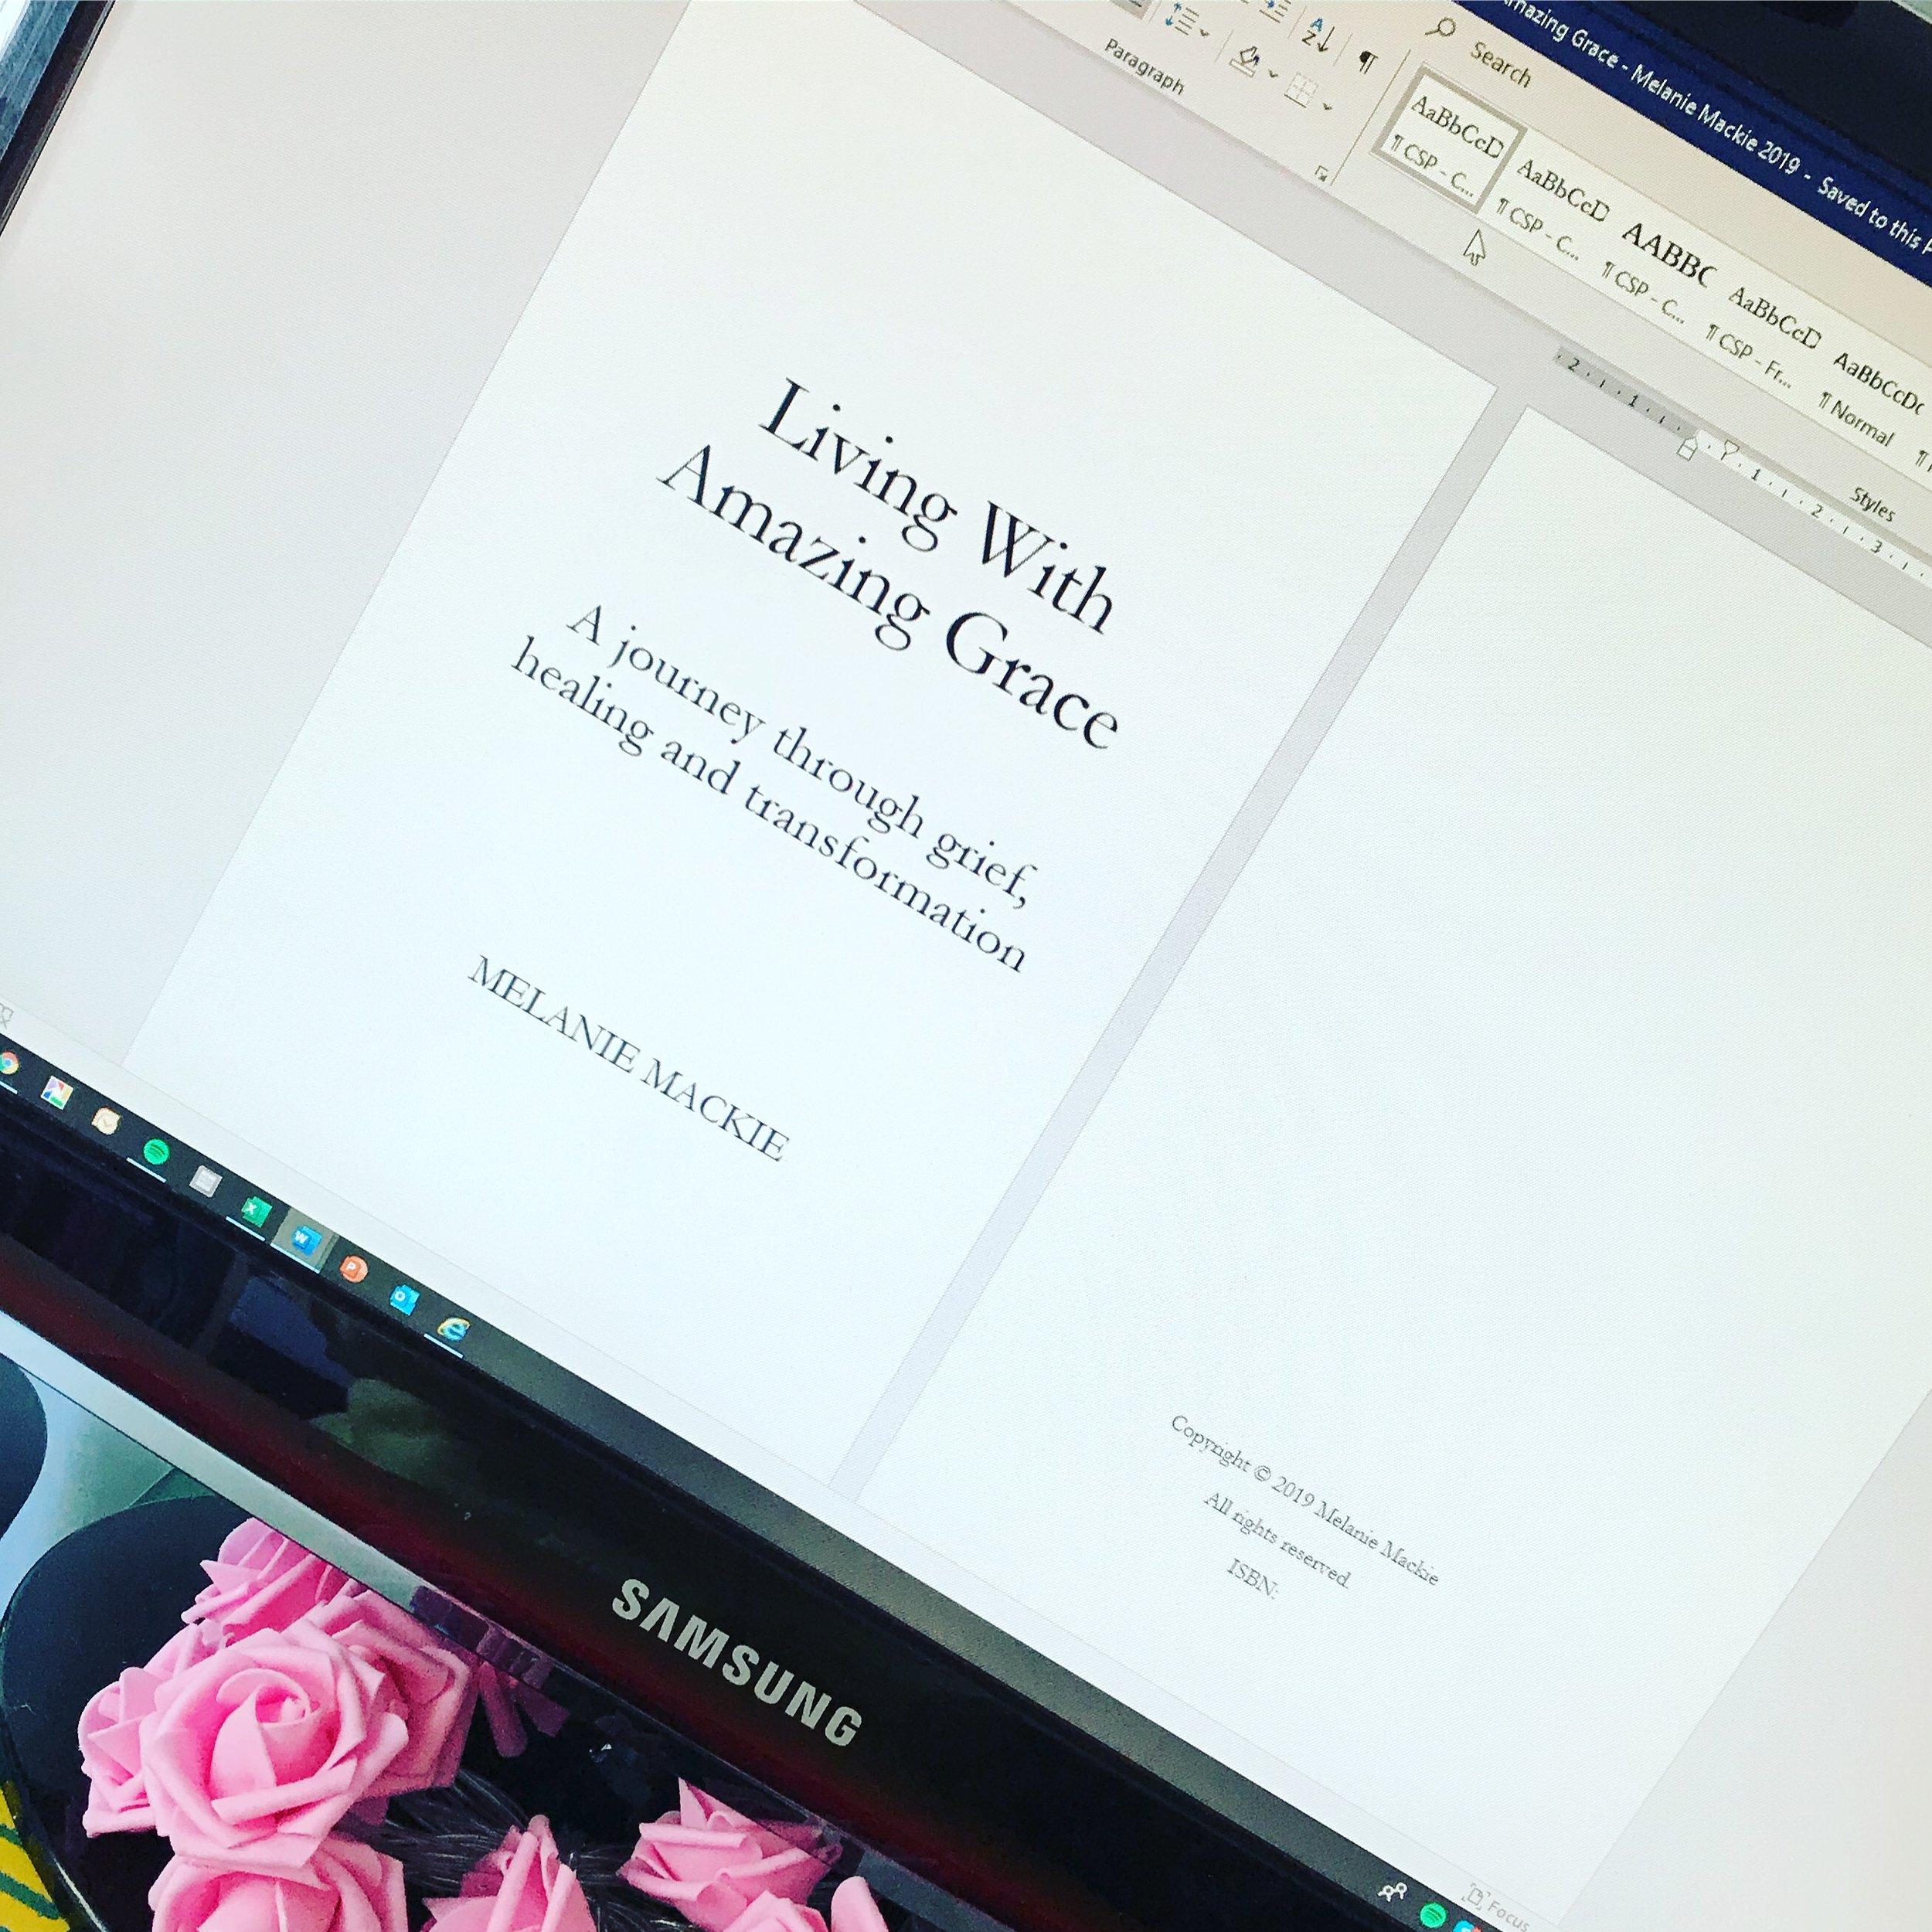 Melanie Mackie Living With Amazing Grace